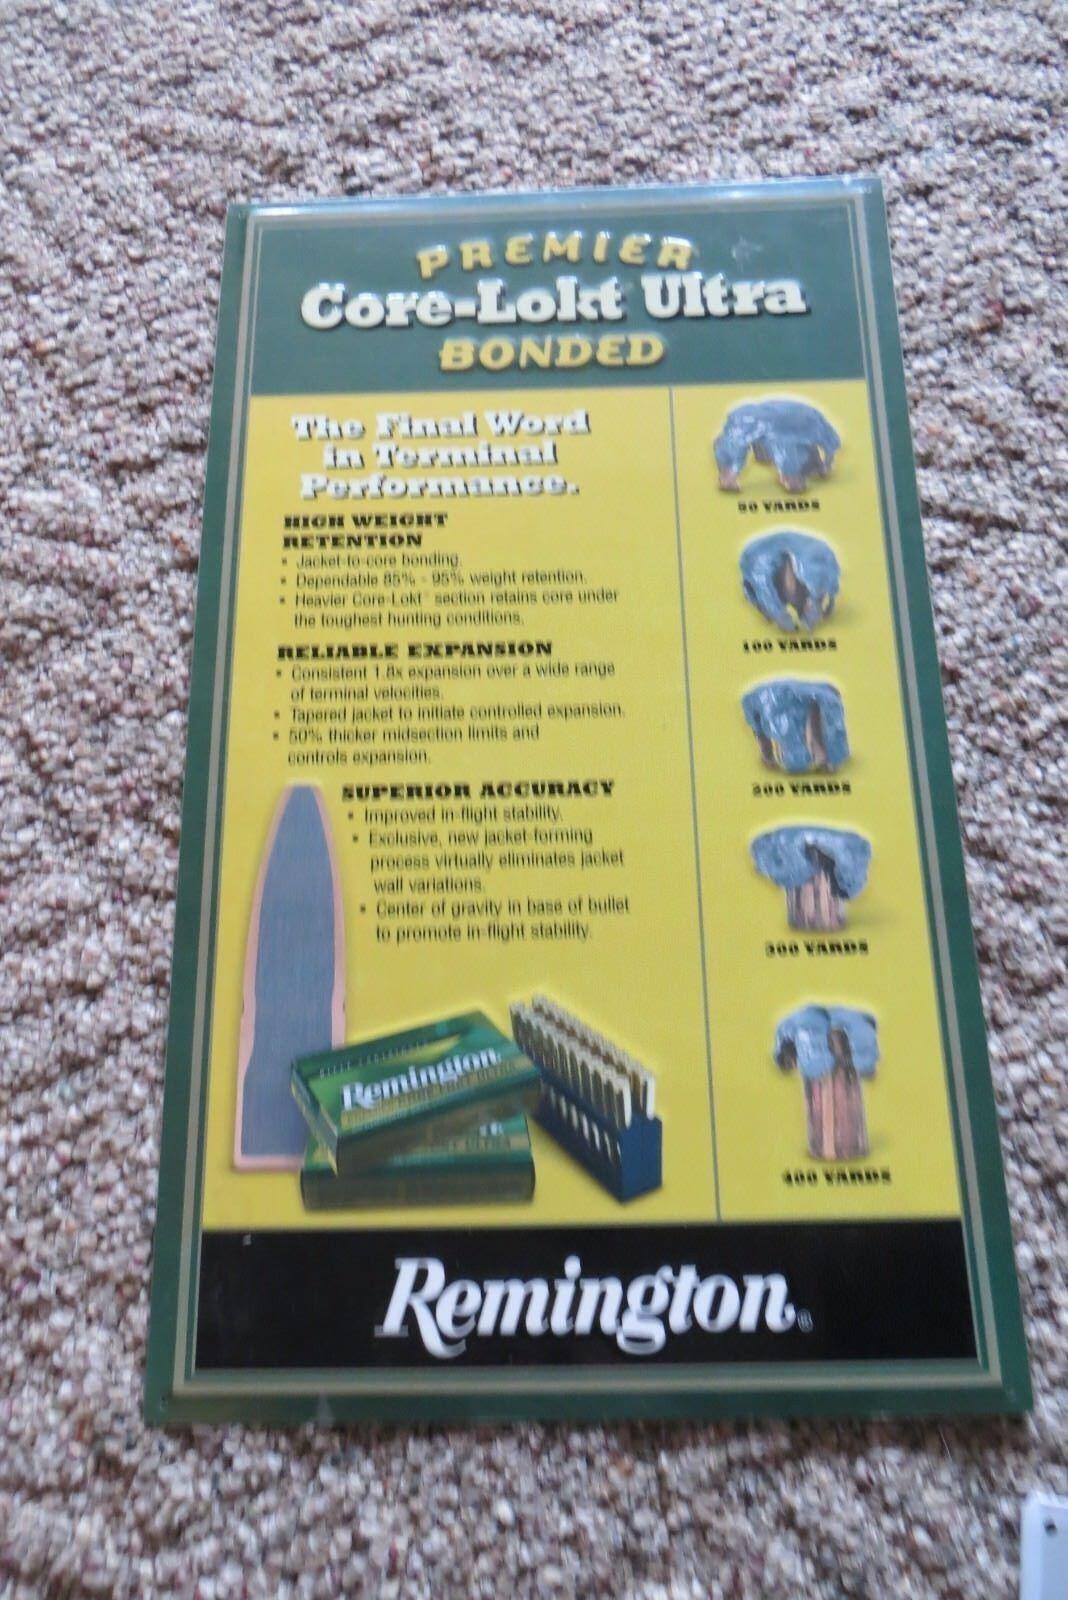 Premier Core-lokt Ultra Bonded Remington Rifle Pistola en relieve de Concha signo de tienda